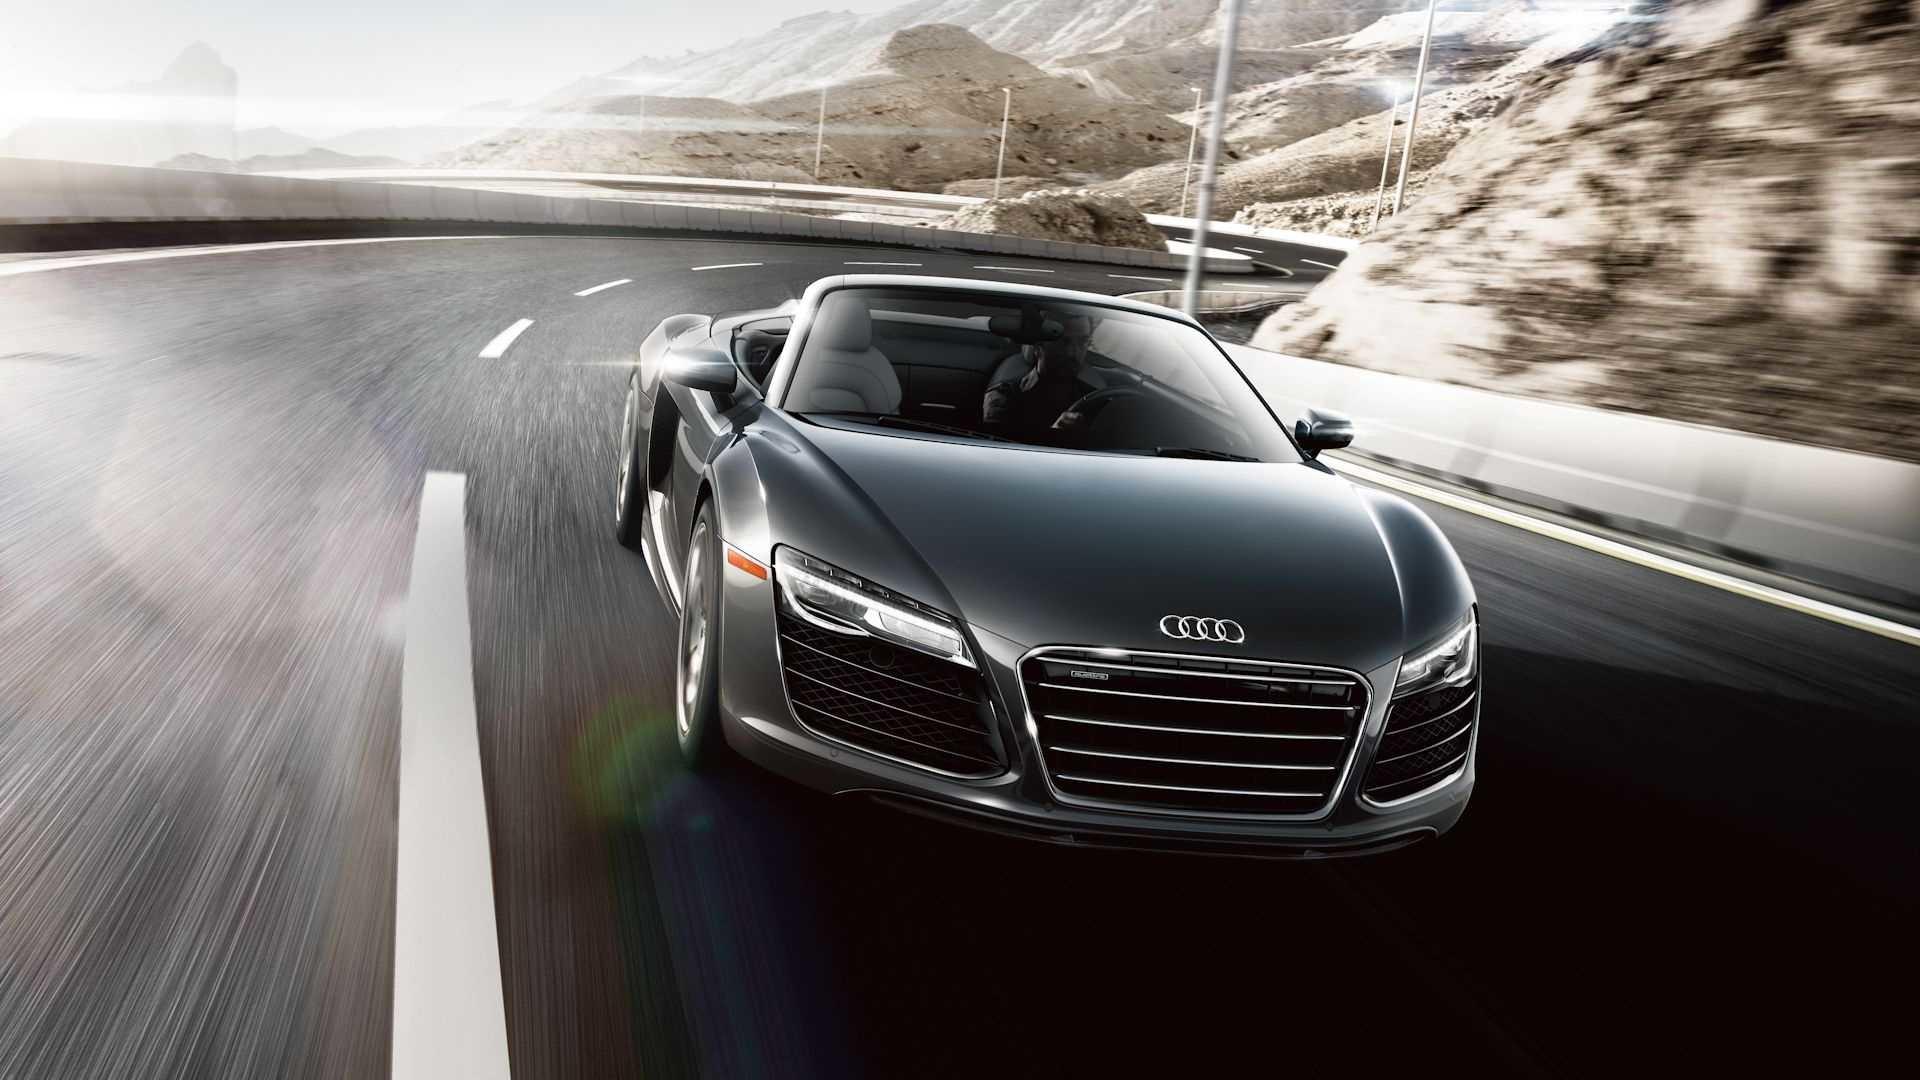 Audi R8 Spyder Wallpaper Wallpapertag